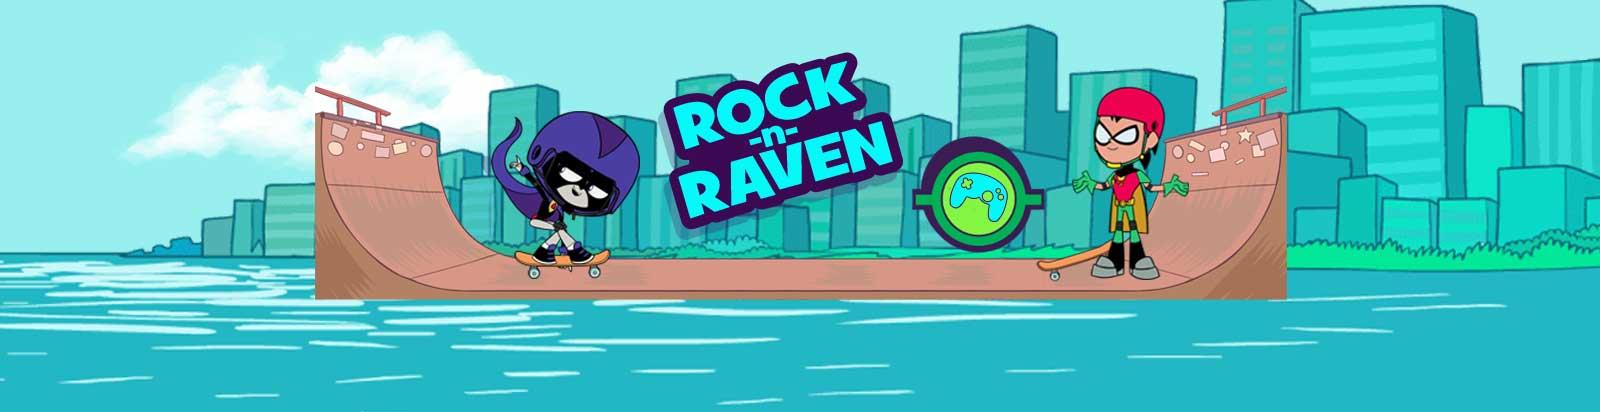 Cartoon Network през юни